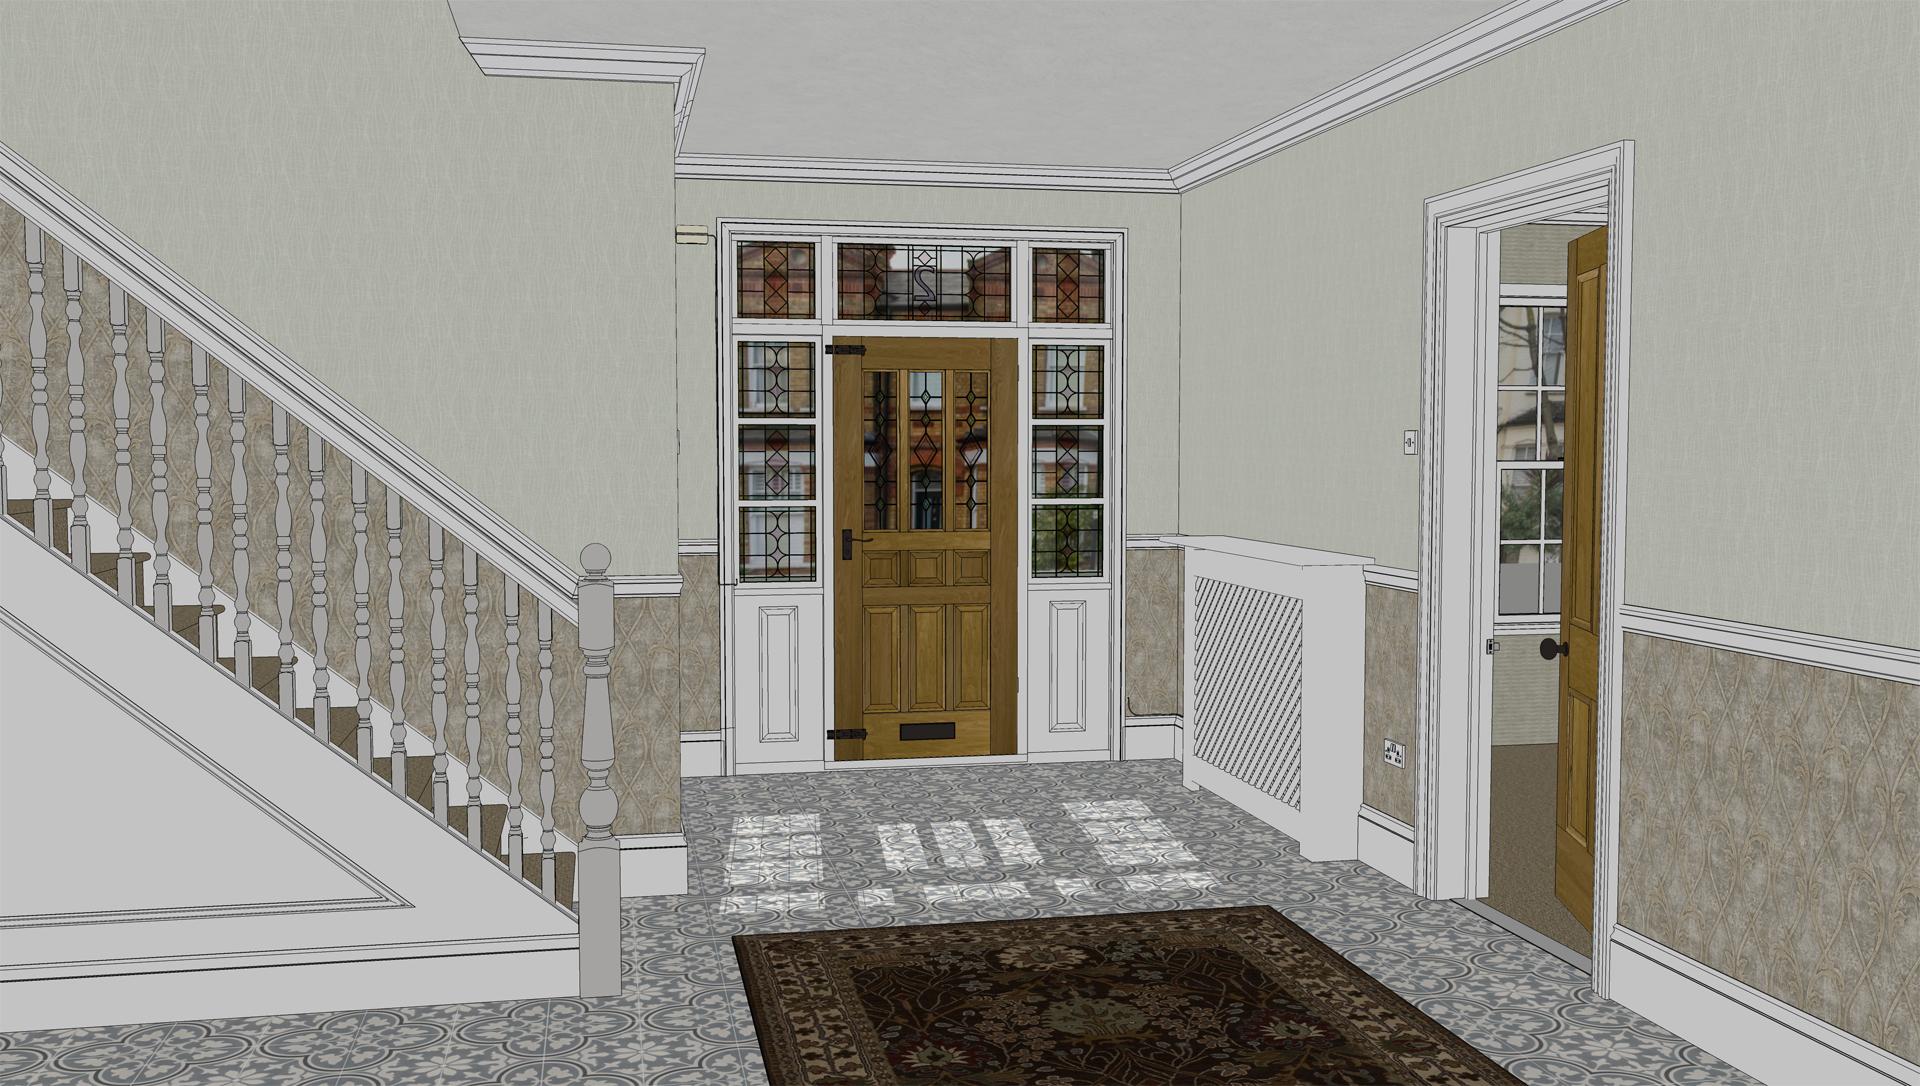 Interior viewport